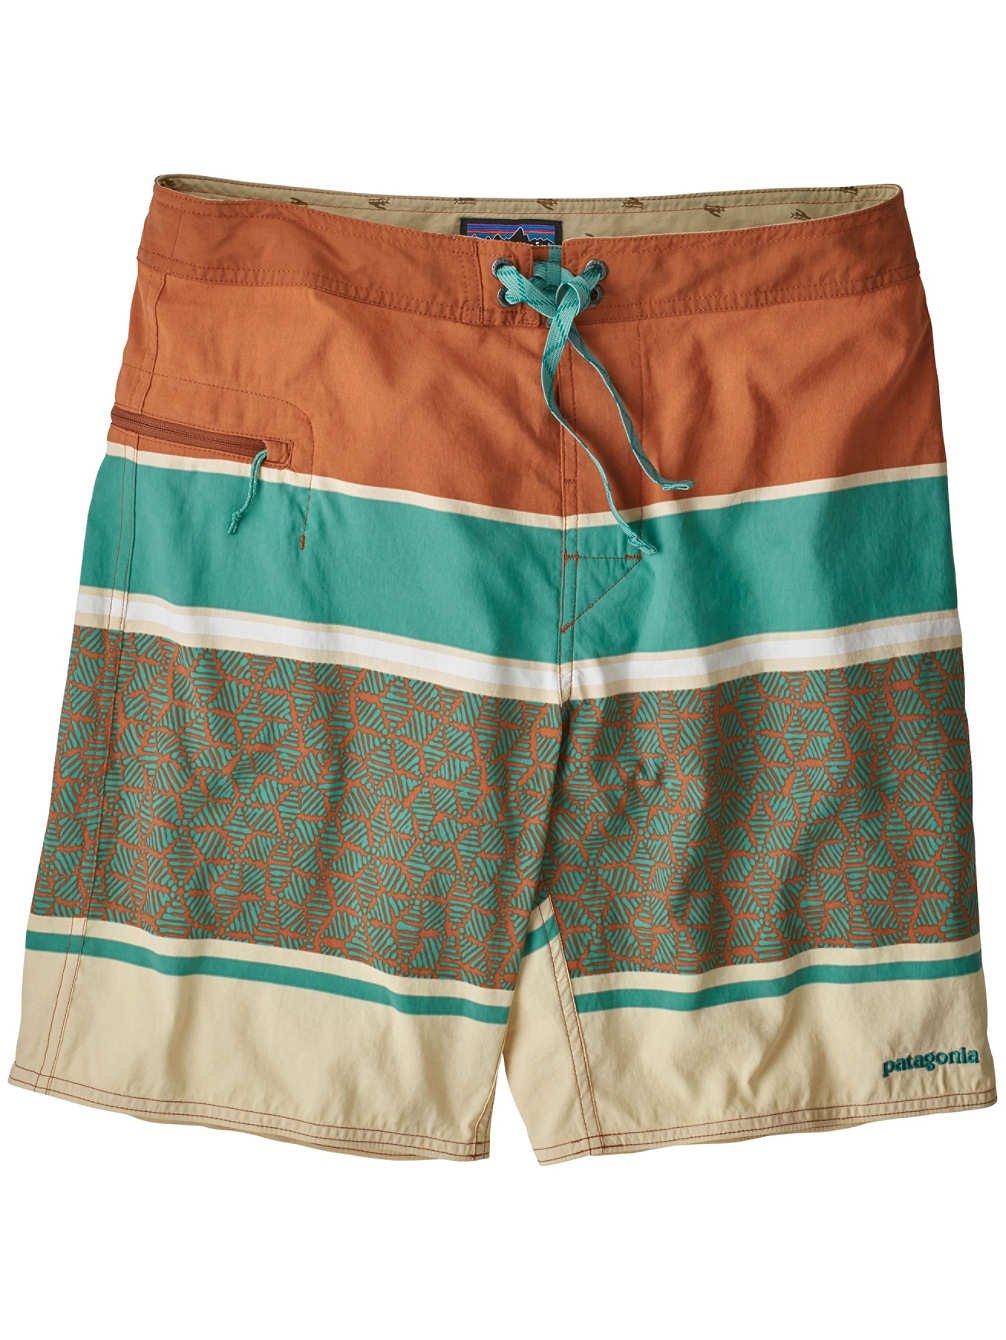 Patagonia M 'S Herren Boardshorts 19 in, Shorts